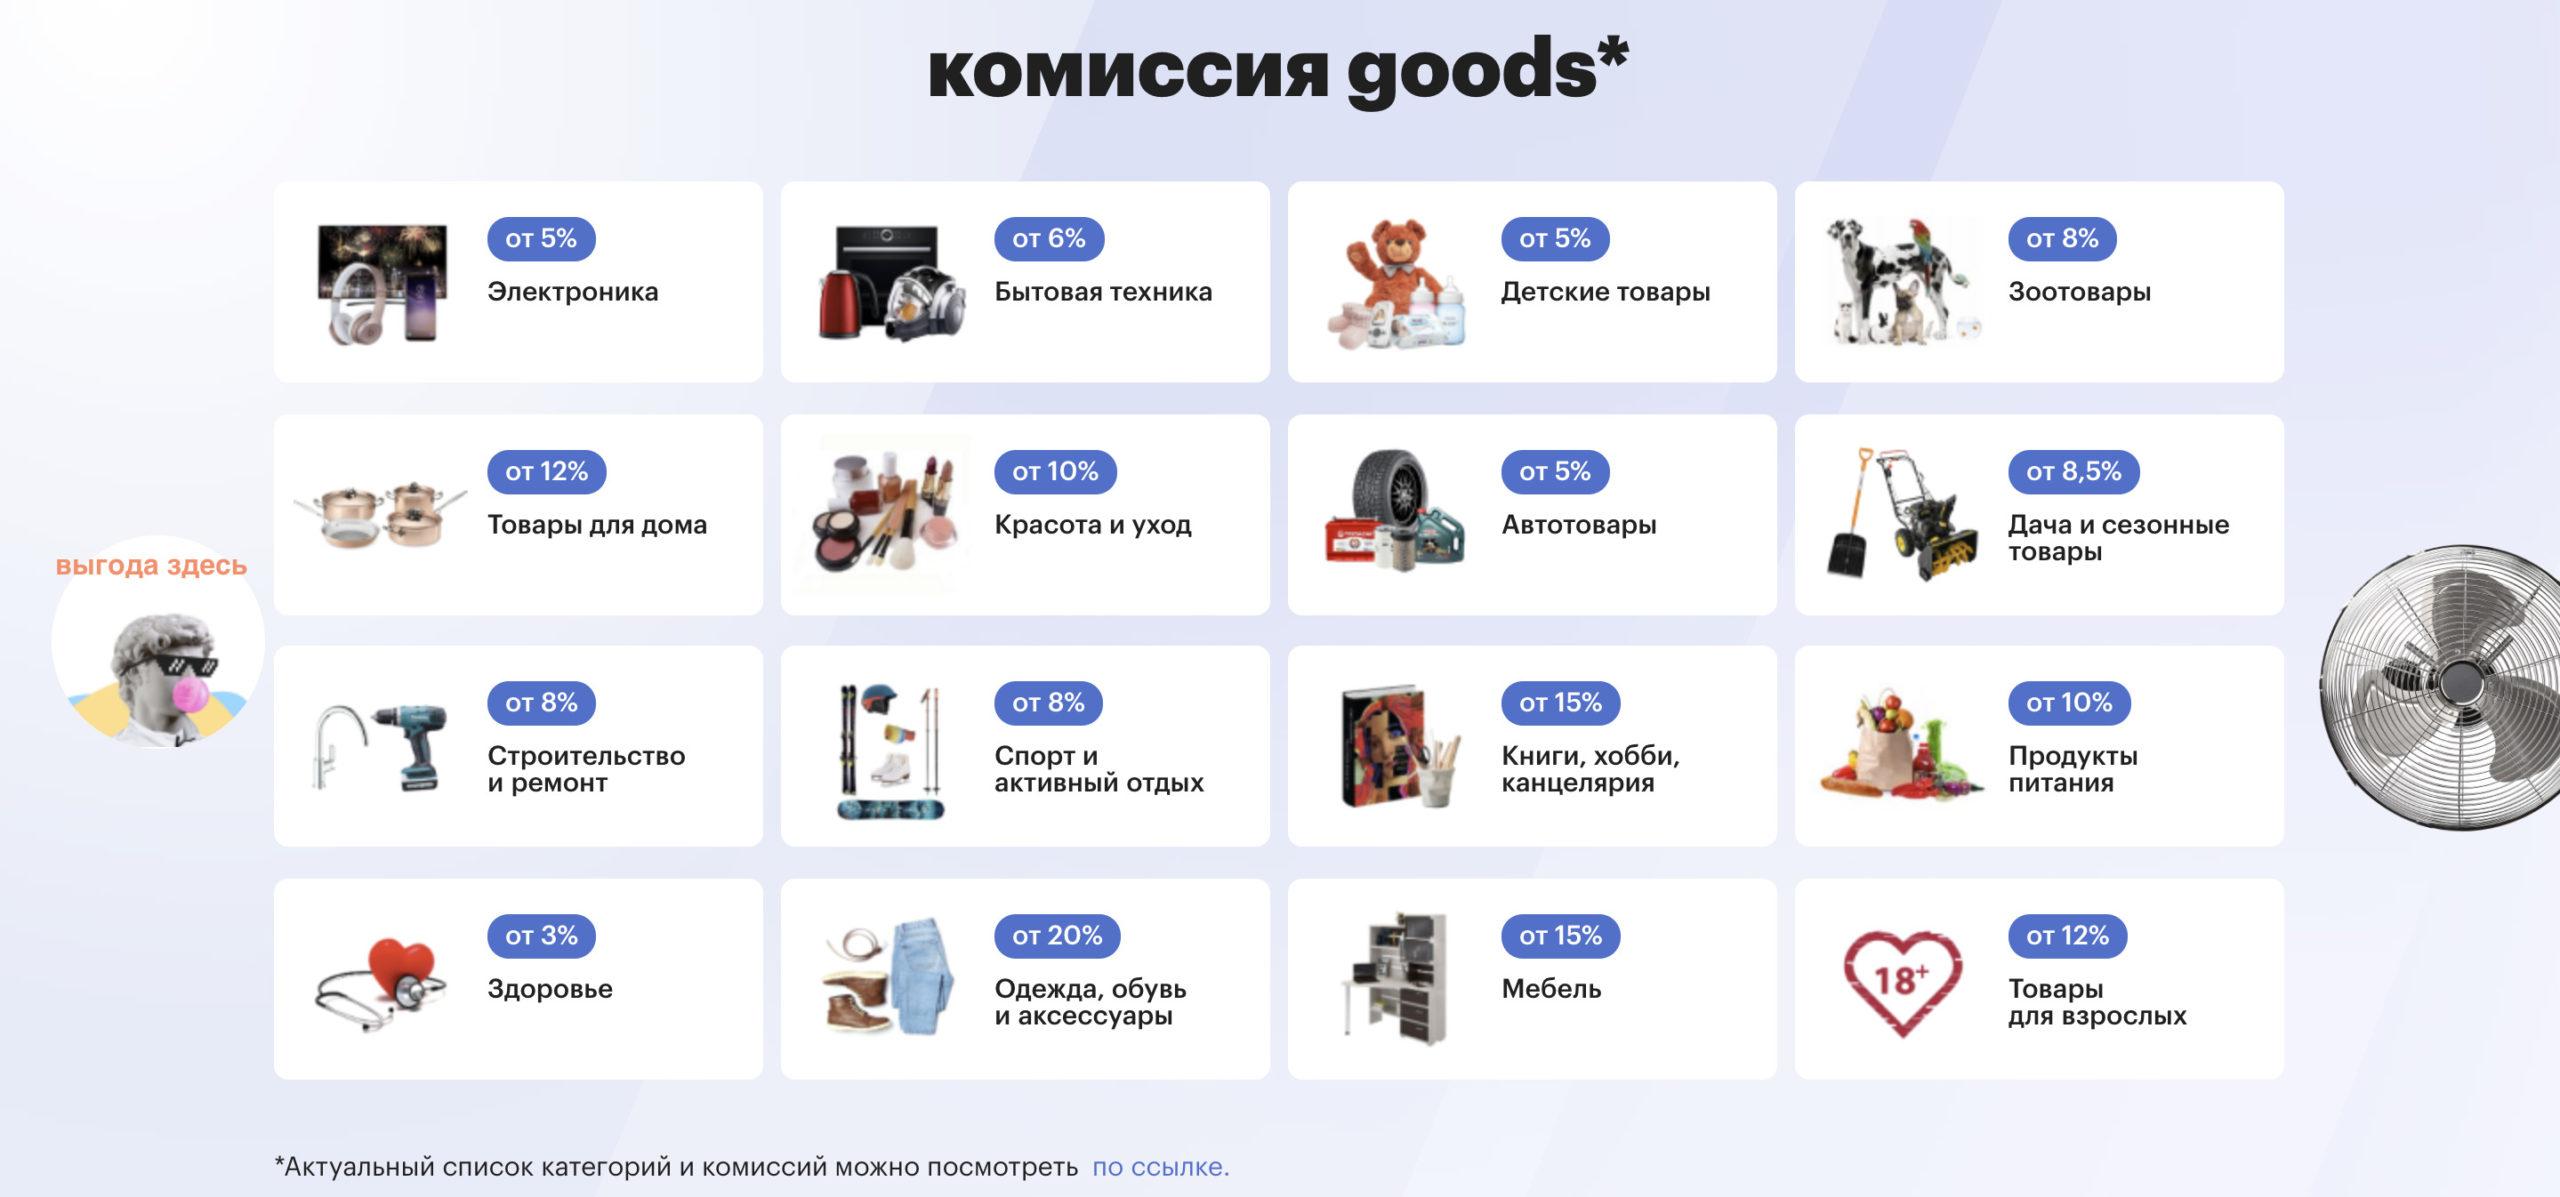 Комиссии продавцам на Goods